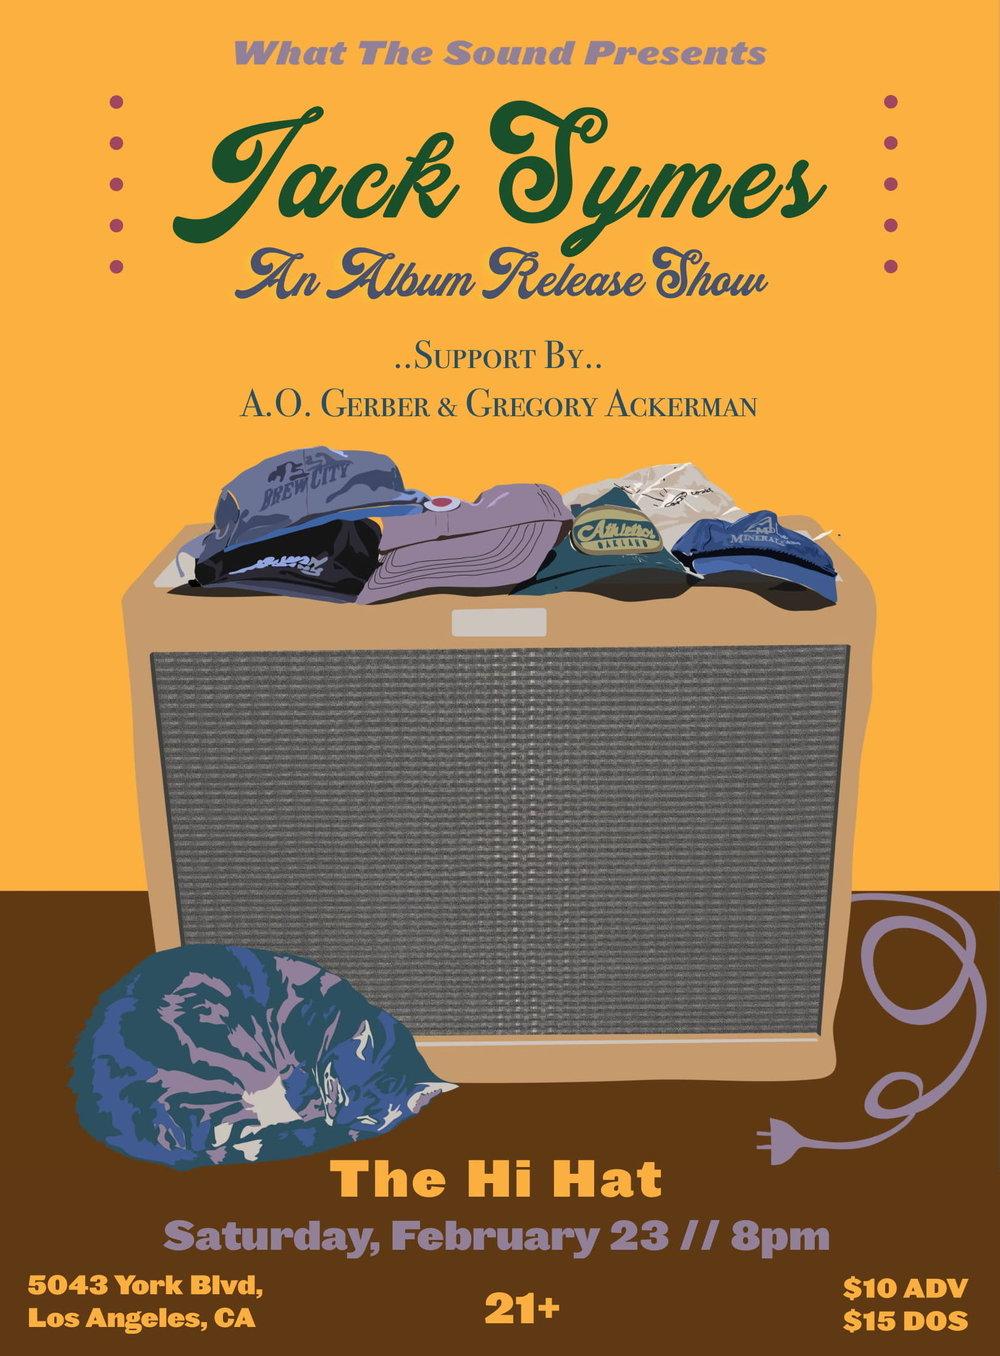 JACK SYMES / A.O. GERBER / GREGORY ACKERMAN - Artwork by Jake ShapiroFebruary 23, 2018 @ The Hi Hat$10 ADV / $15 DOS21+